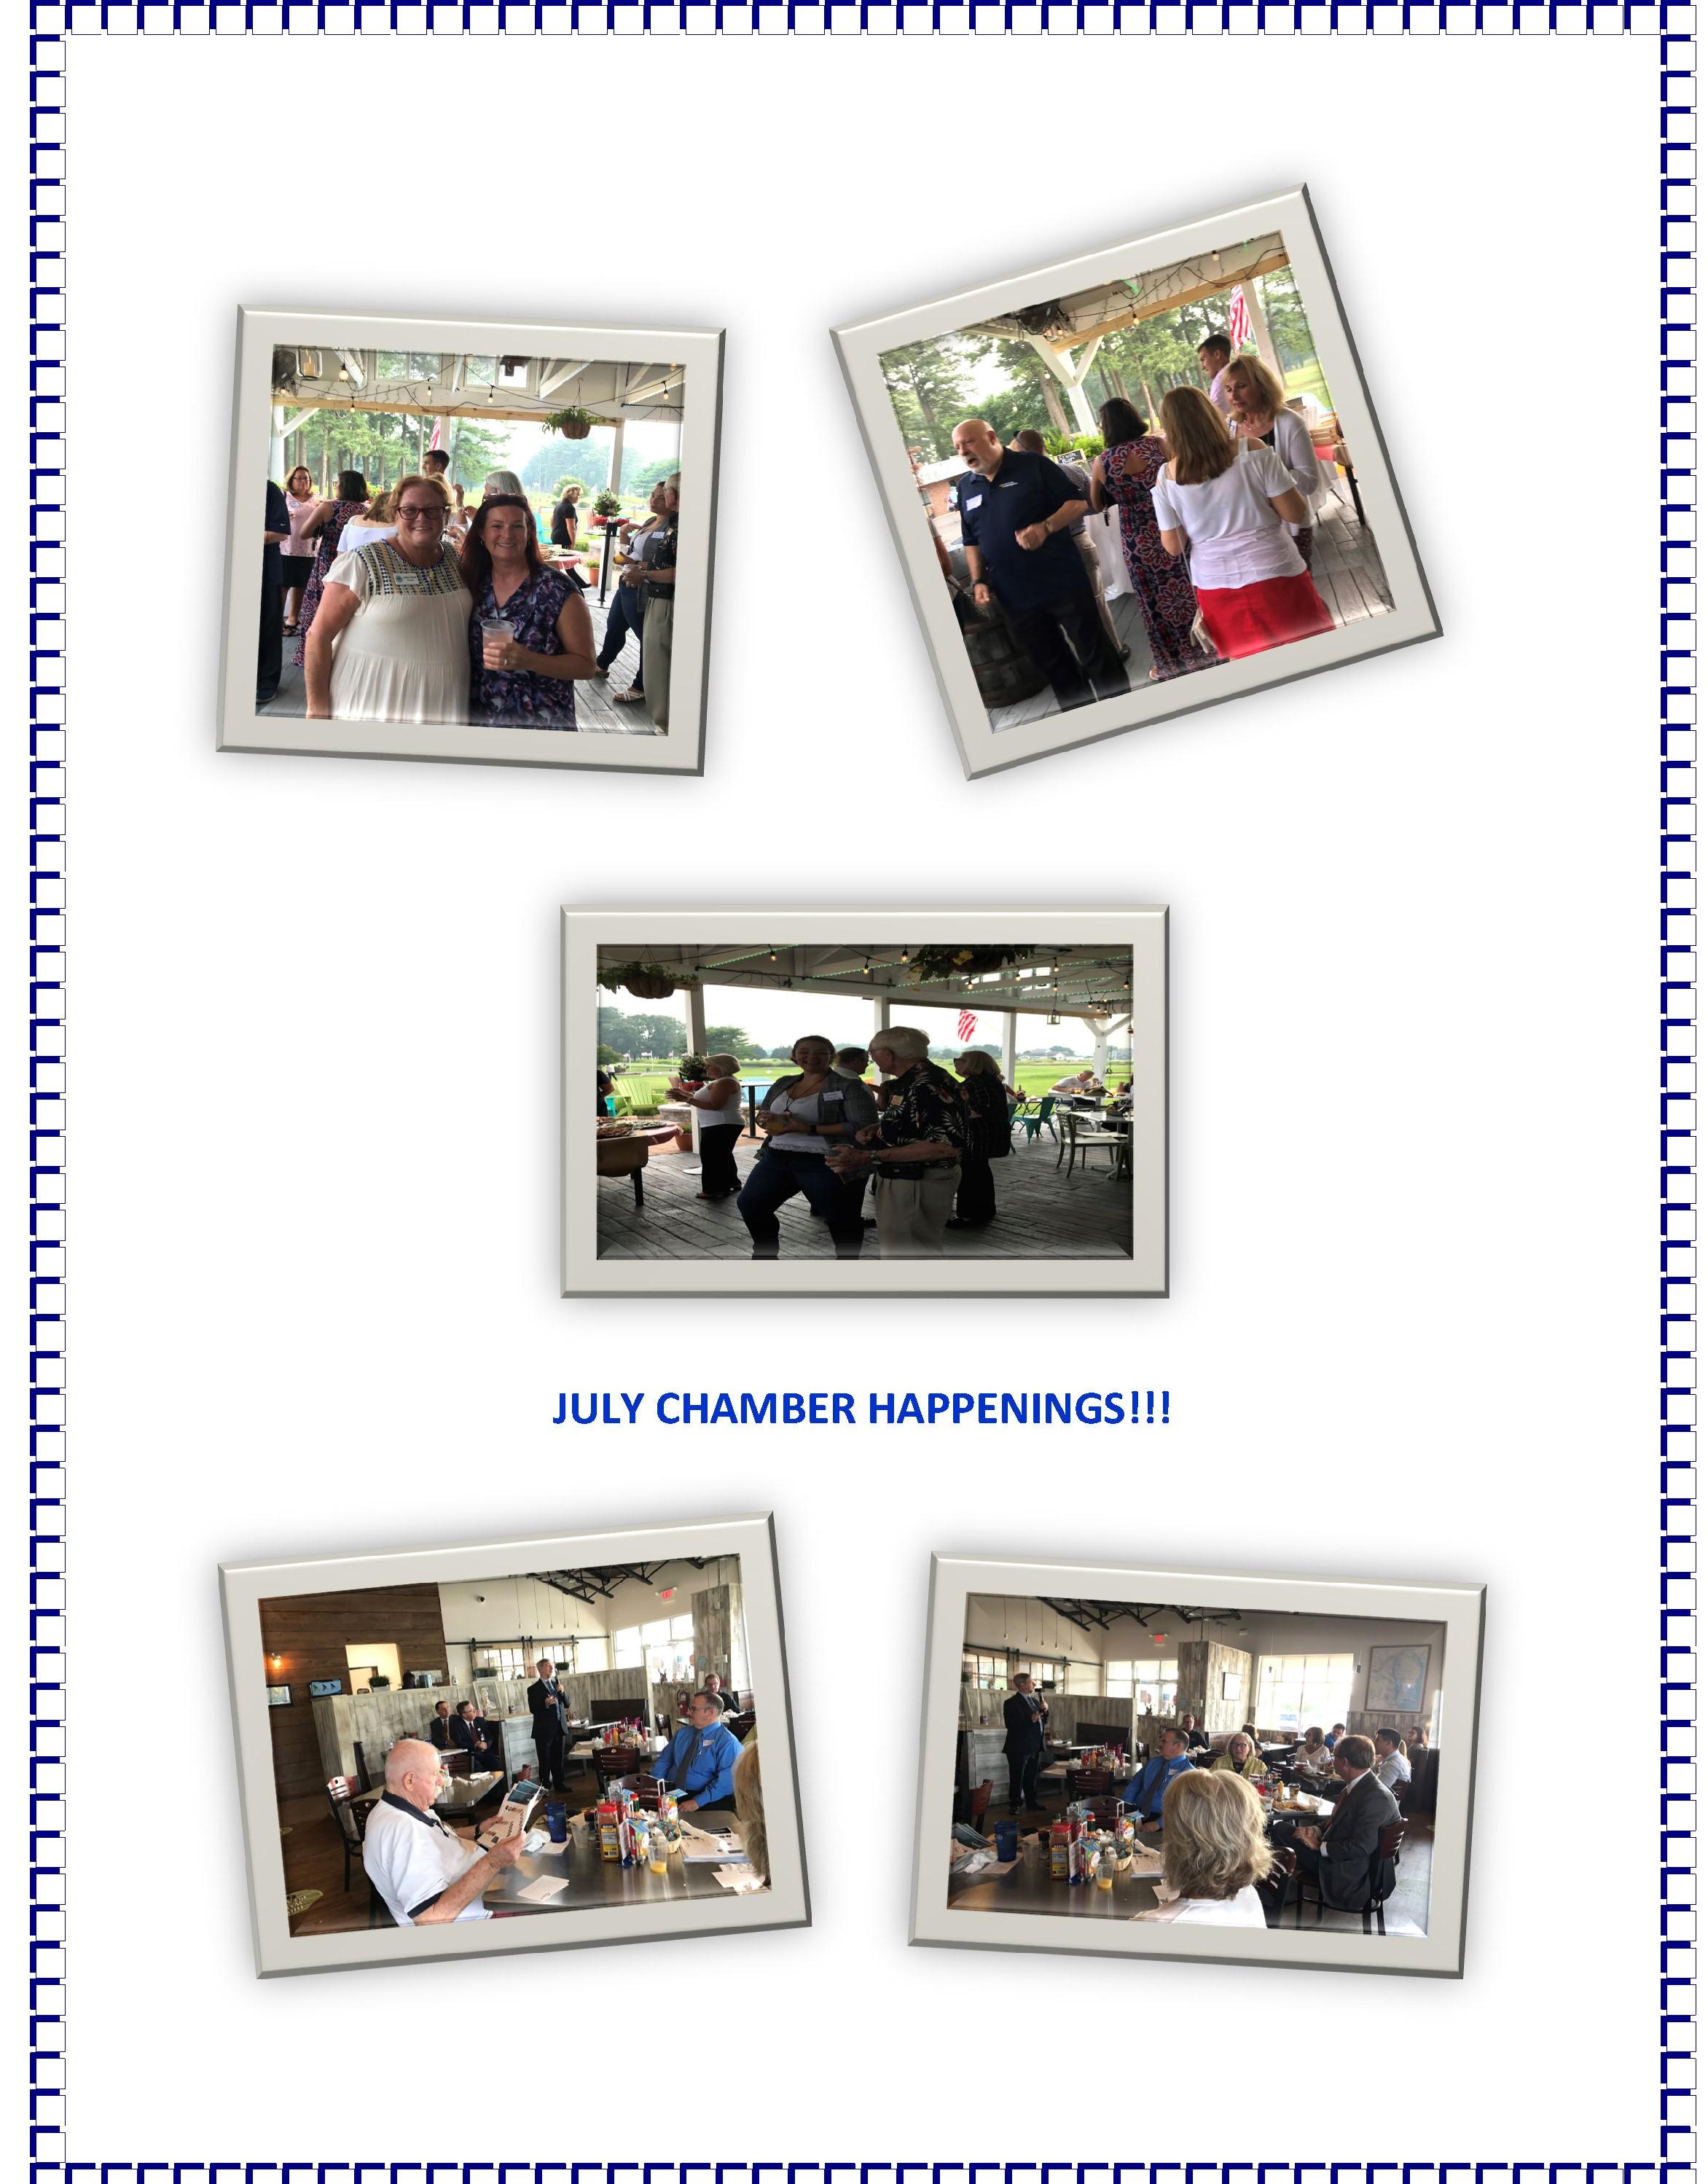 July networking fun!!